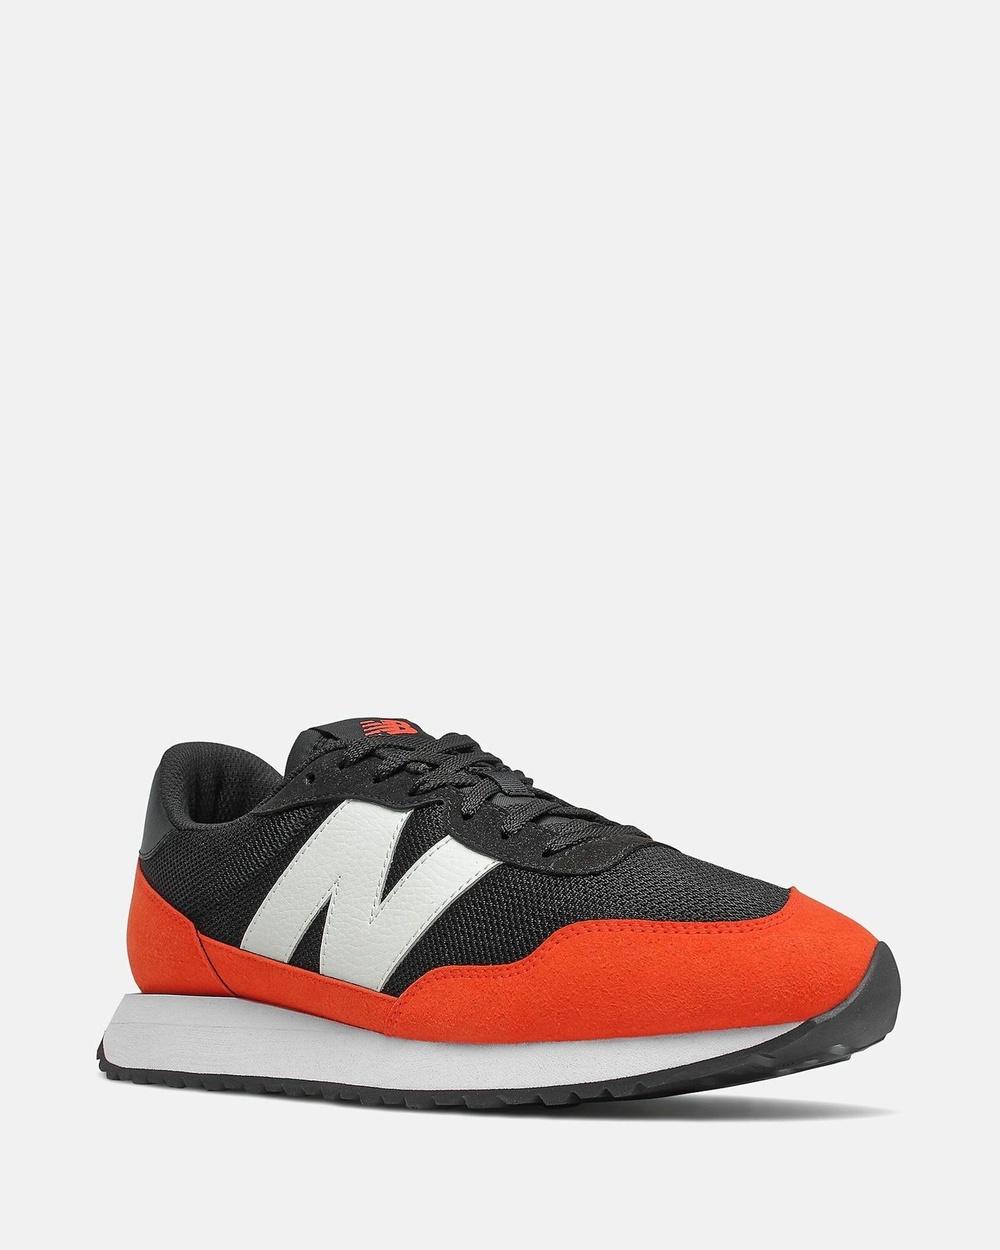 New Balance MS237V1 Standard Fit Men's Performance Shoes Black Australia